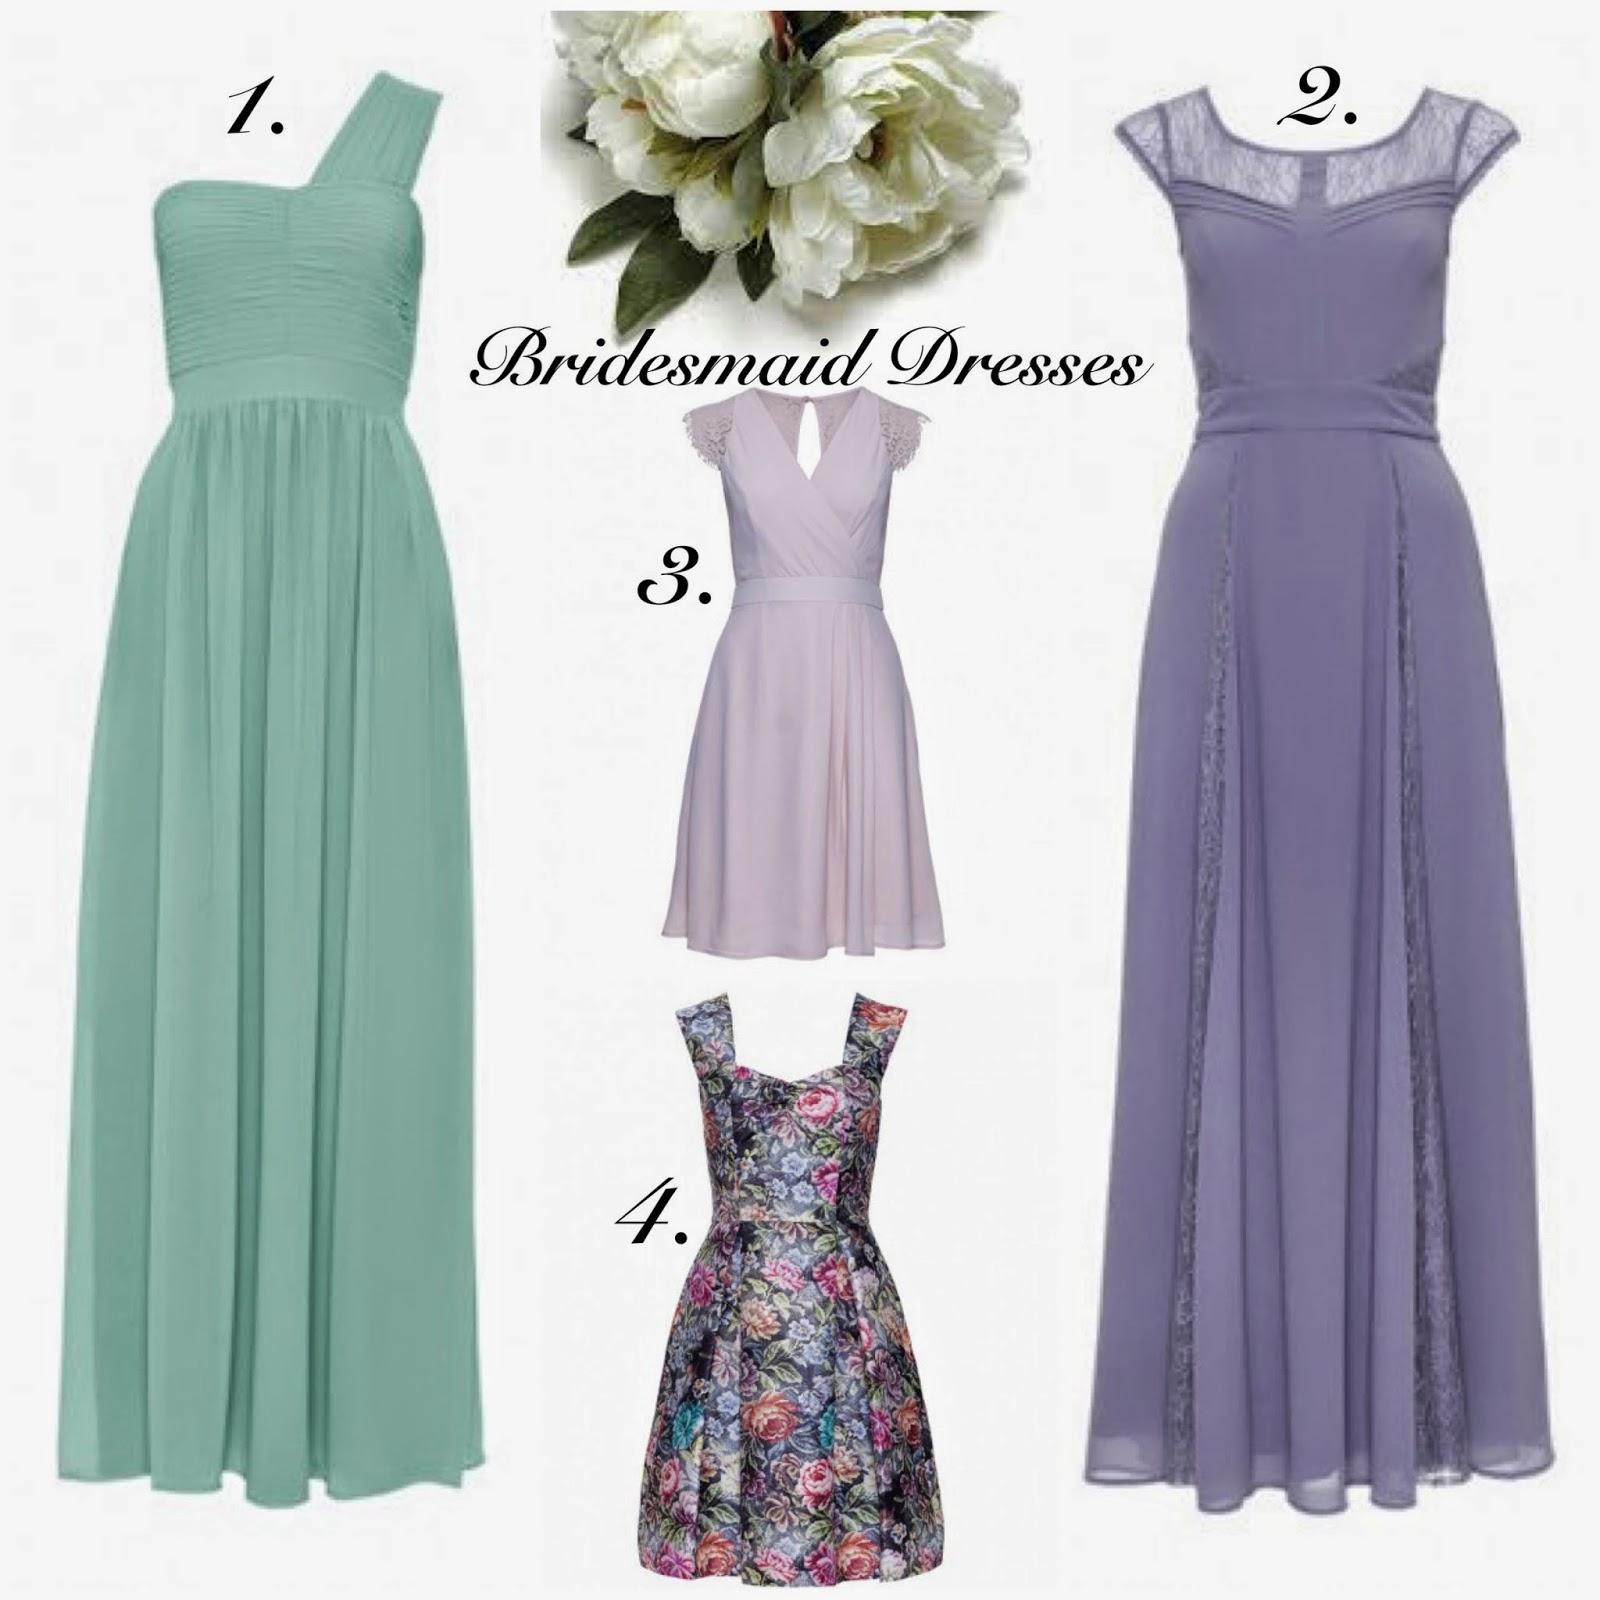 Review Bridesmaid Dresses, Australia Review Bridesmaid Dresses, bridesmaids dresses online, pastel bridesmaid dresses